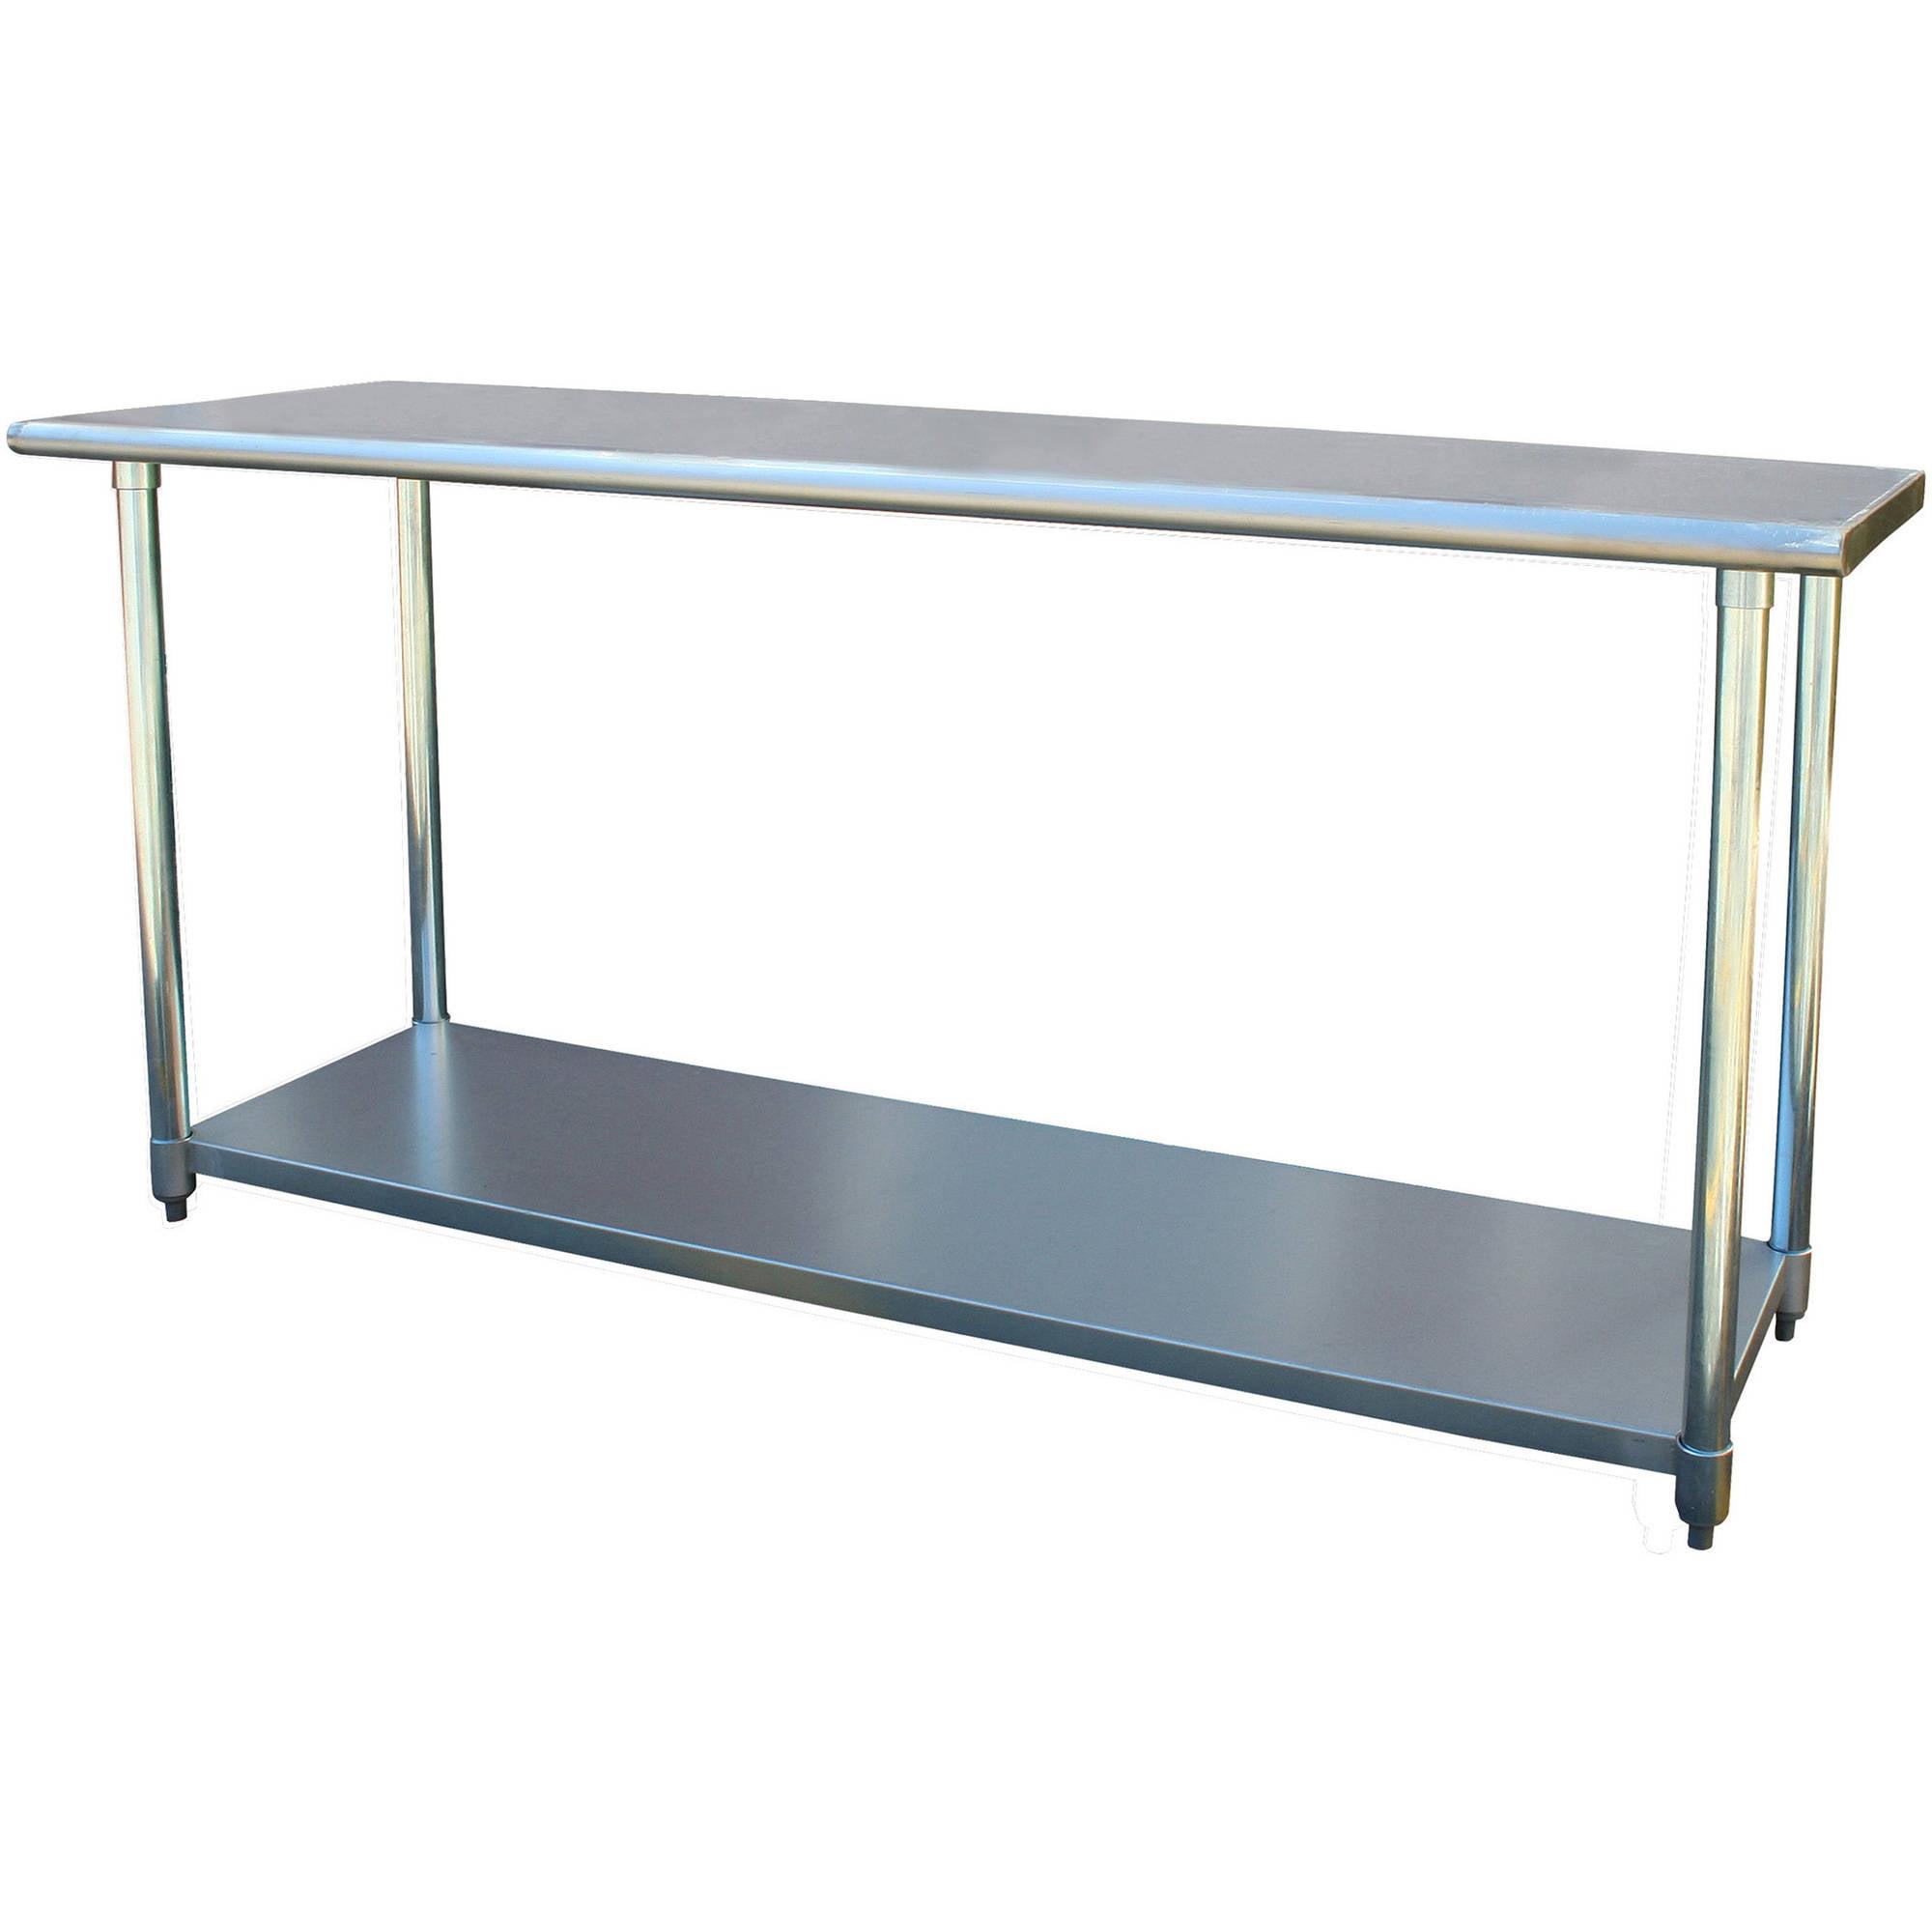 "Sportsman Series Stainless Steel Work Table, 24"" x 72"